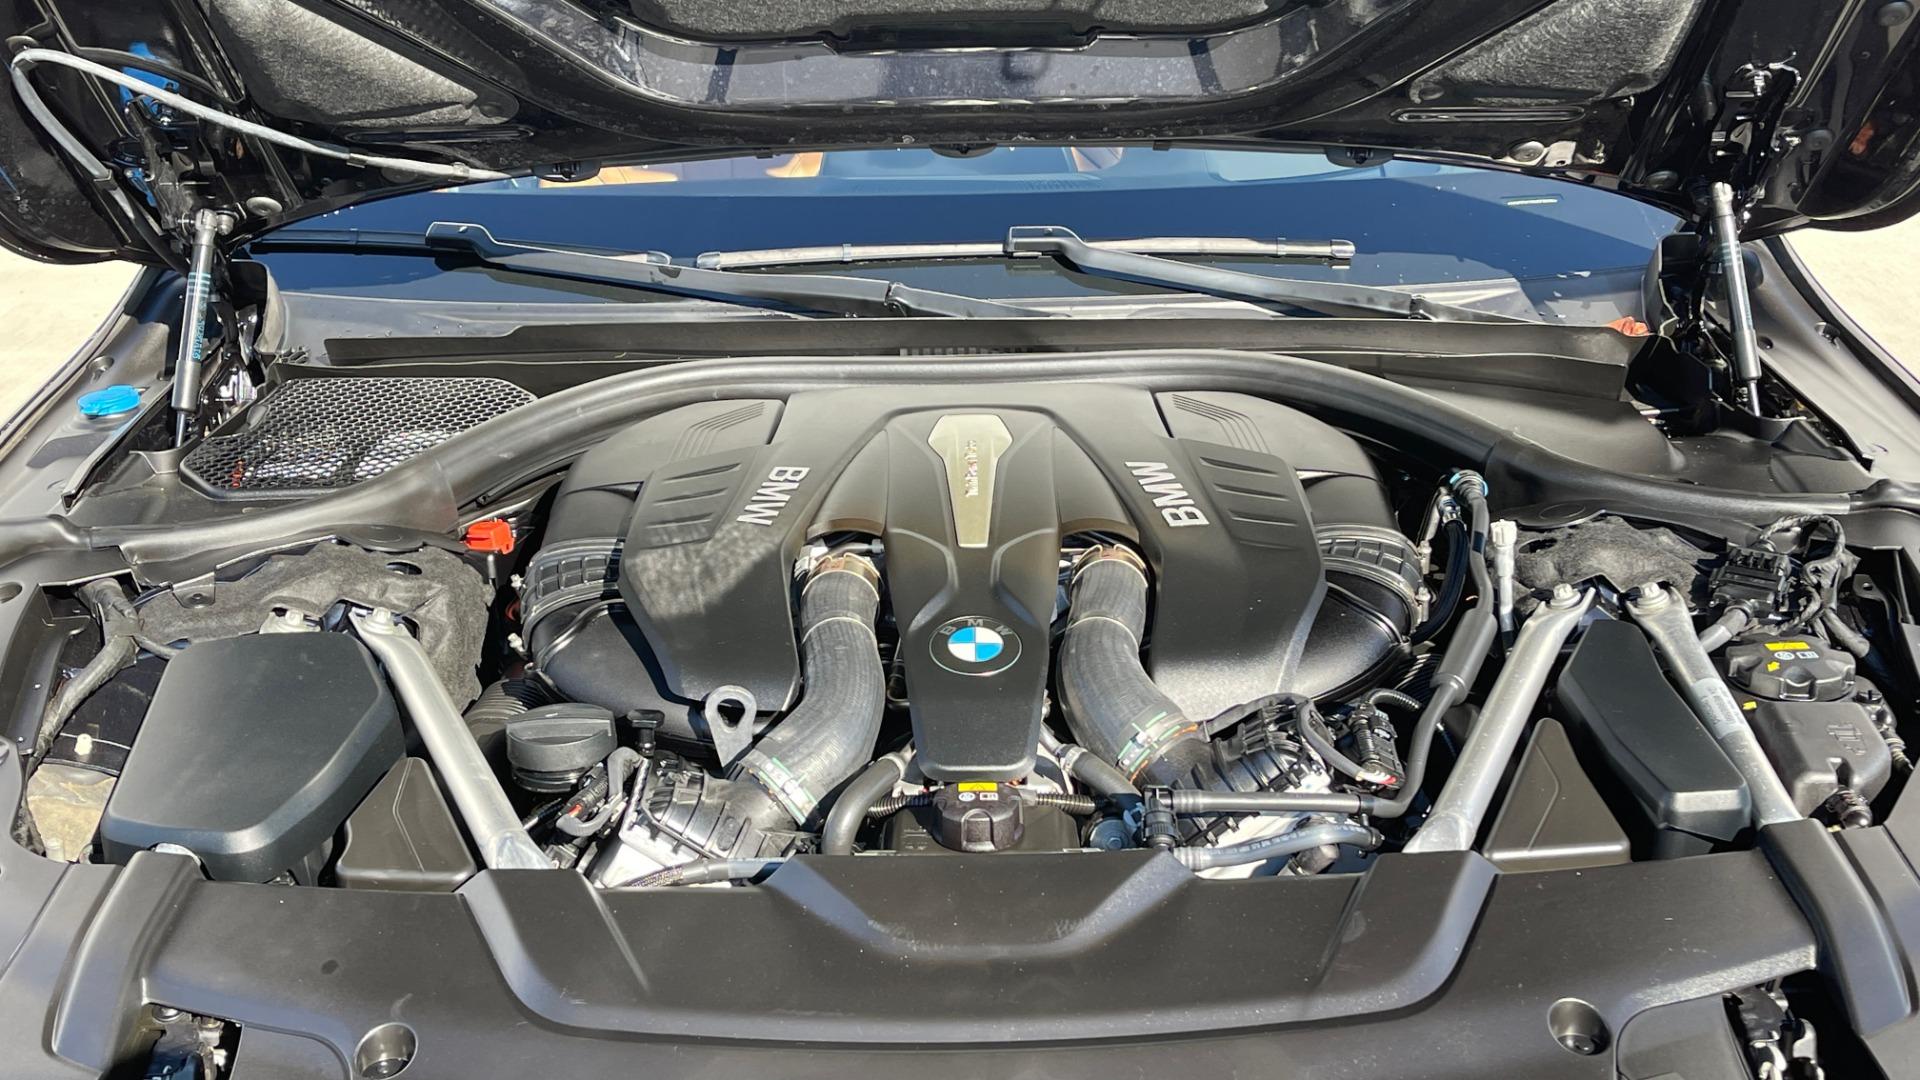 Used 2019 BMW 7 SERIES 750I XDRIVE M-SPORT / EXEC PKG / DRVR ASST PLUS / CLD WTHR / PAR for sale $60,995 at Formula Imports in Charlotte NC 28227 10